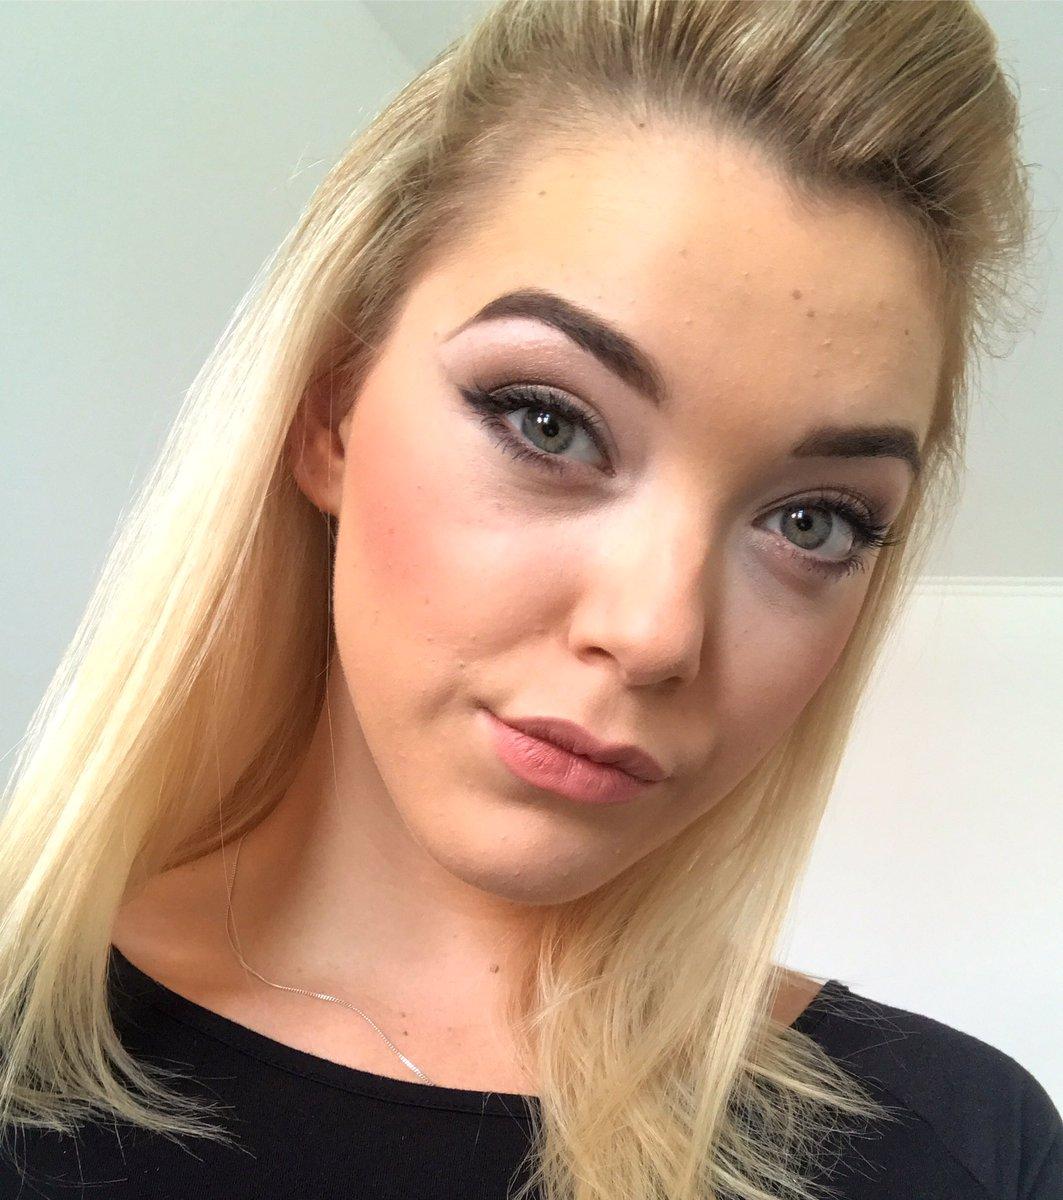 #Selfiesunday 👸🏼📸 #selfie #selfietime #blonde #doll 👉 NACSm2Yhgx 👈 fPzy4Ci